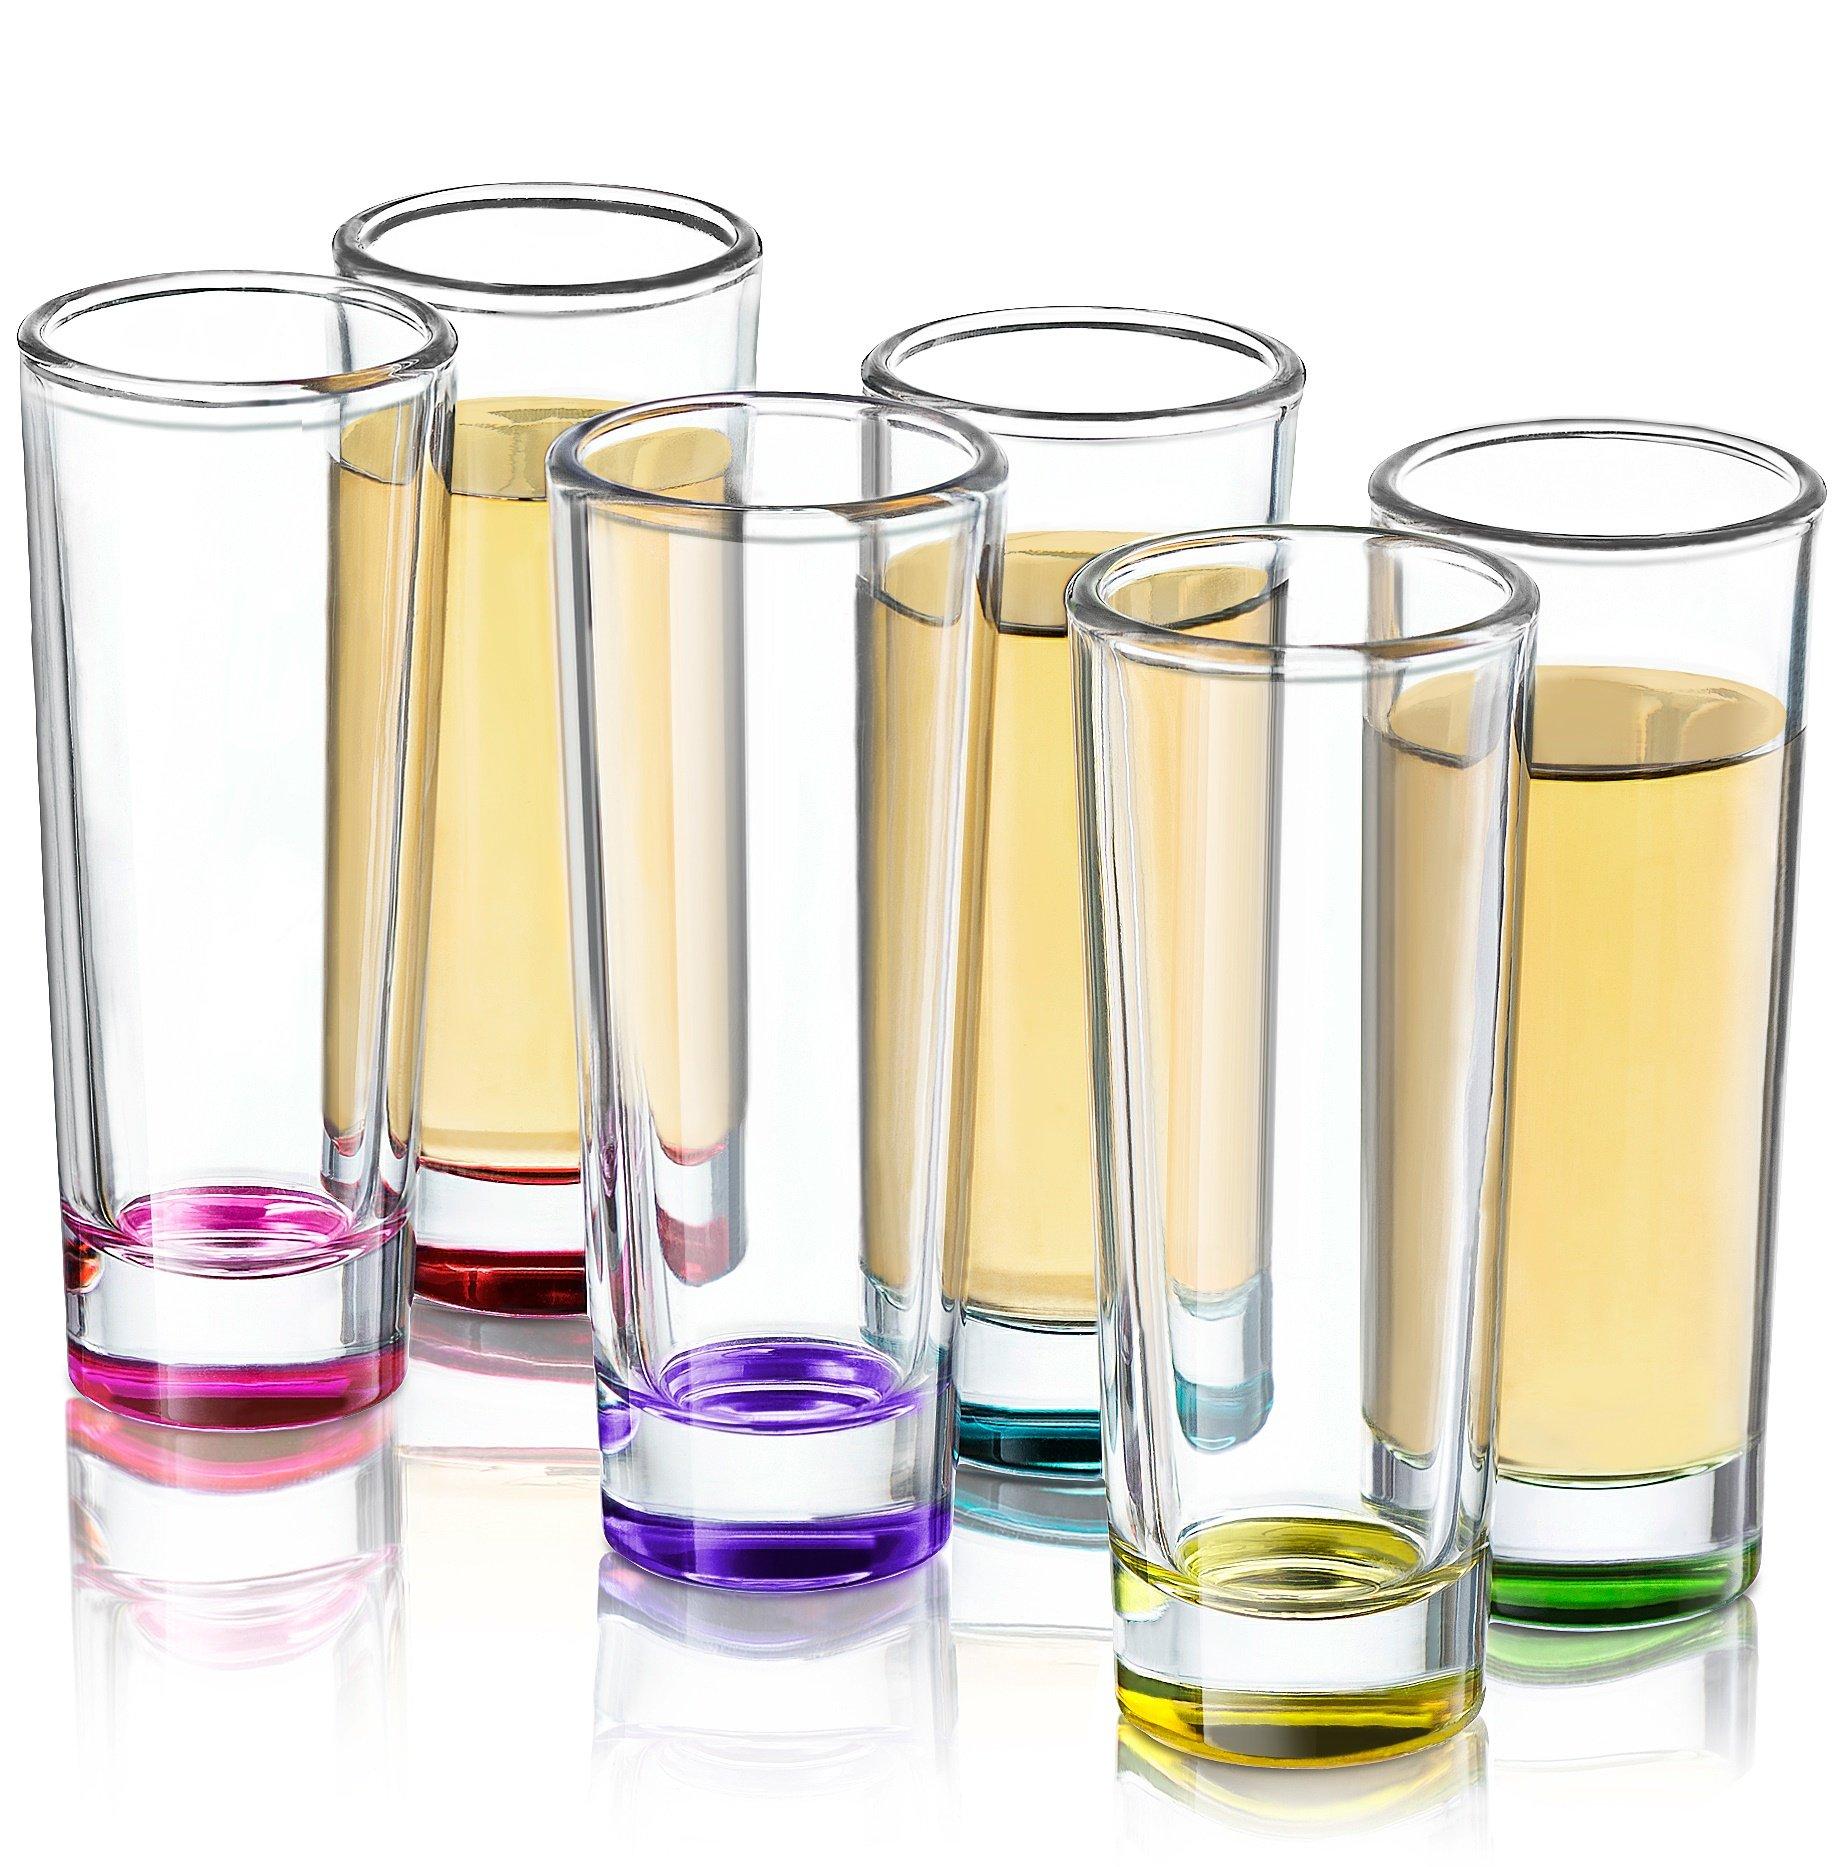 JoyJolt Hue Colored Shot glass Set, 6 Piece Shot Glasses